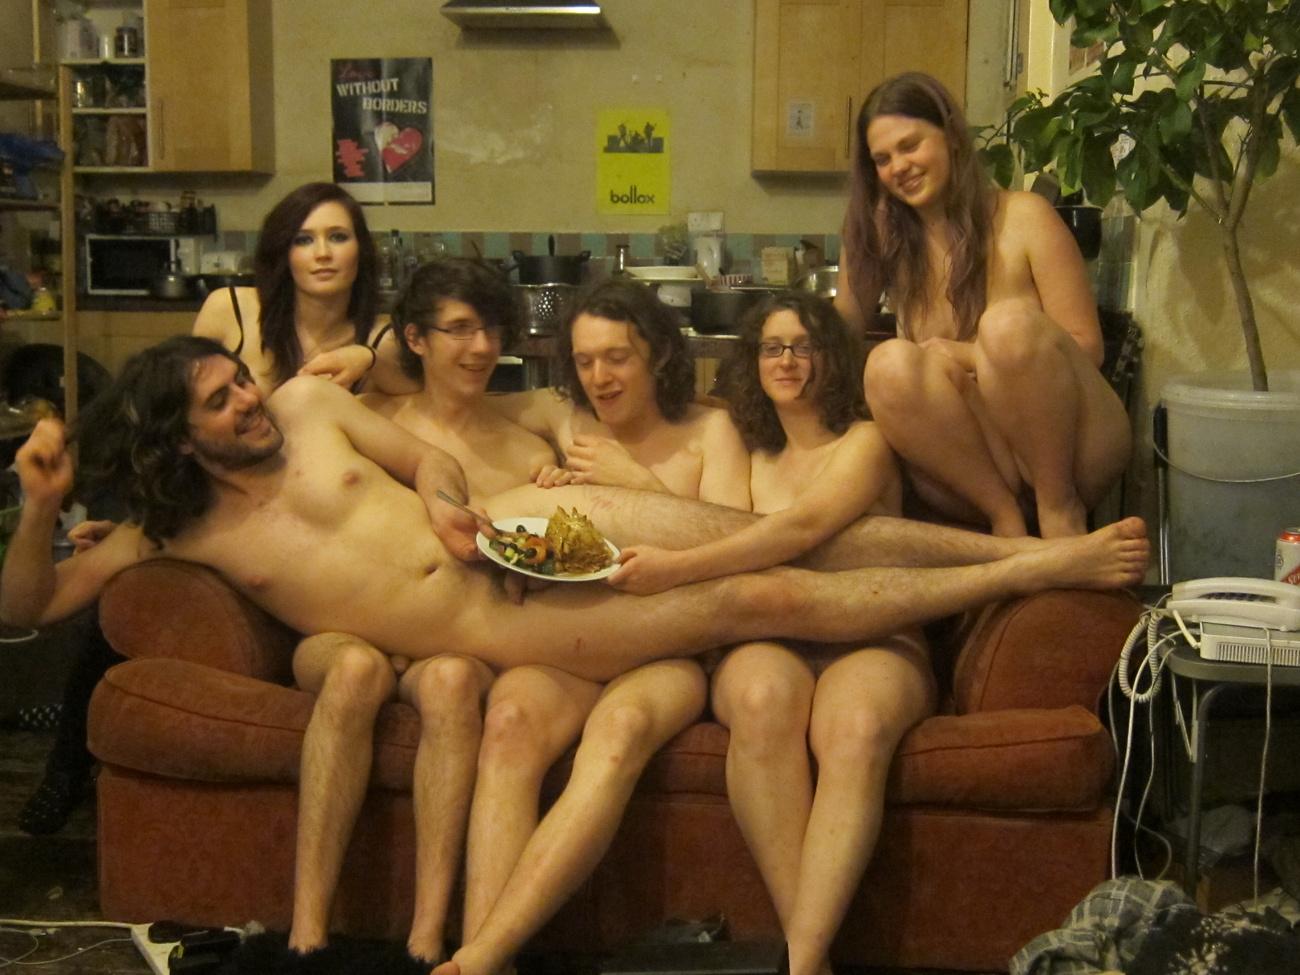 Forrás: Nakedvegancooking.com